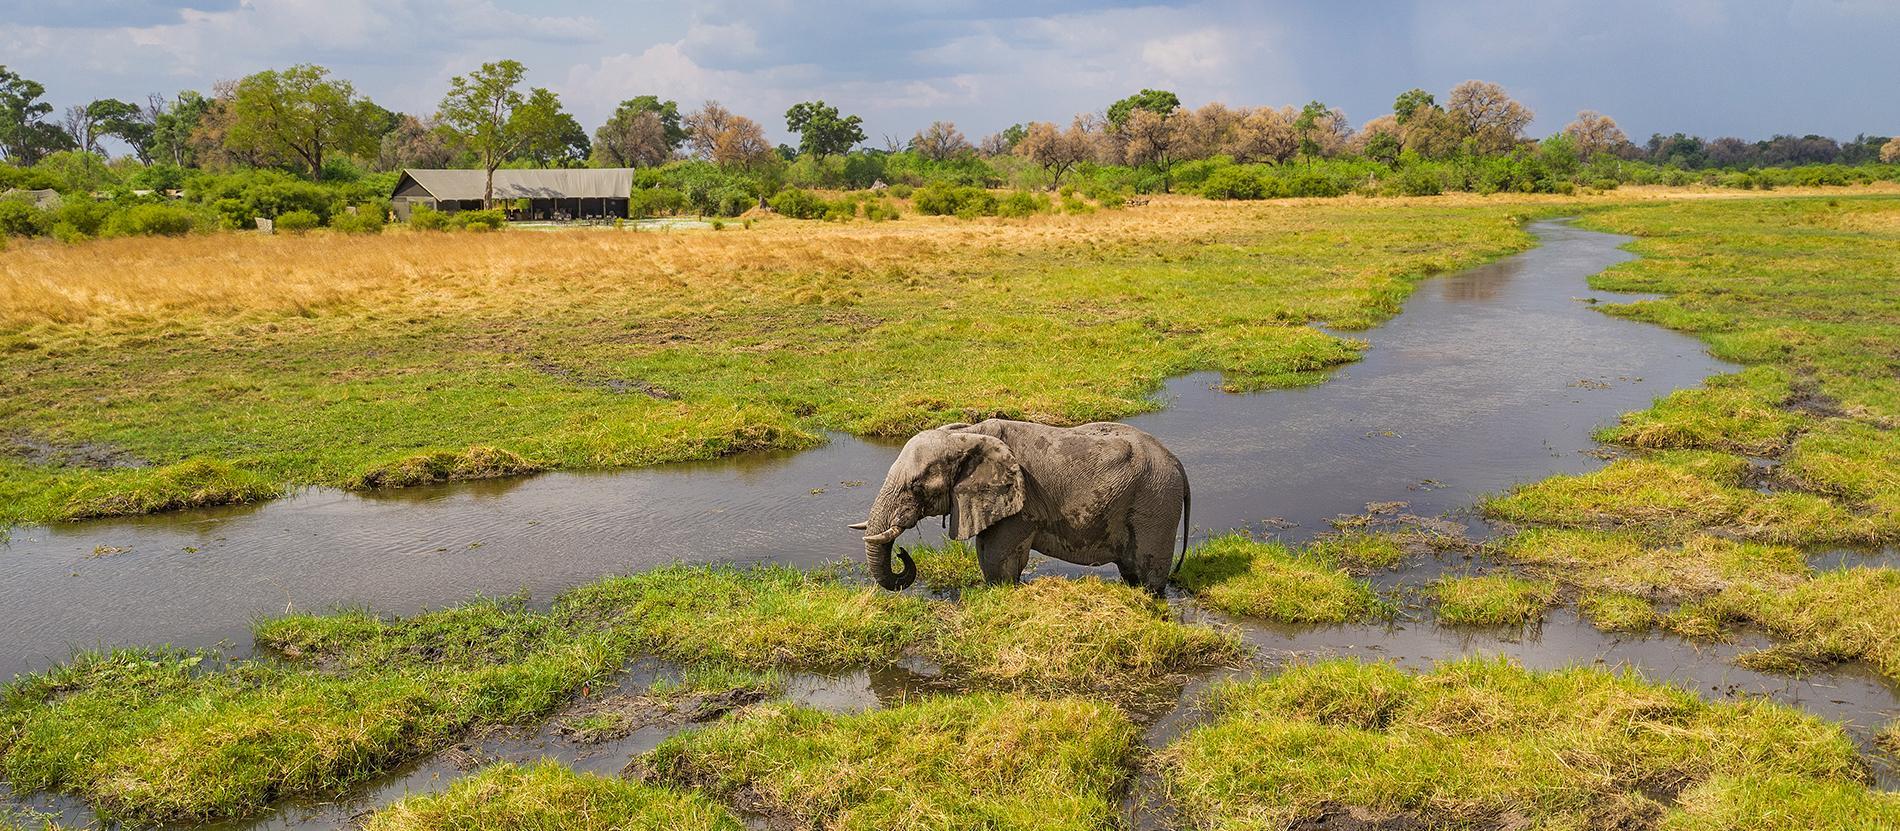 Botswana Photo Safari Amp Wildlife Tour 2020 Amp 2021